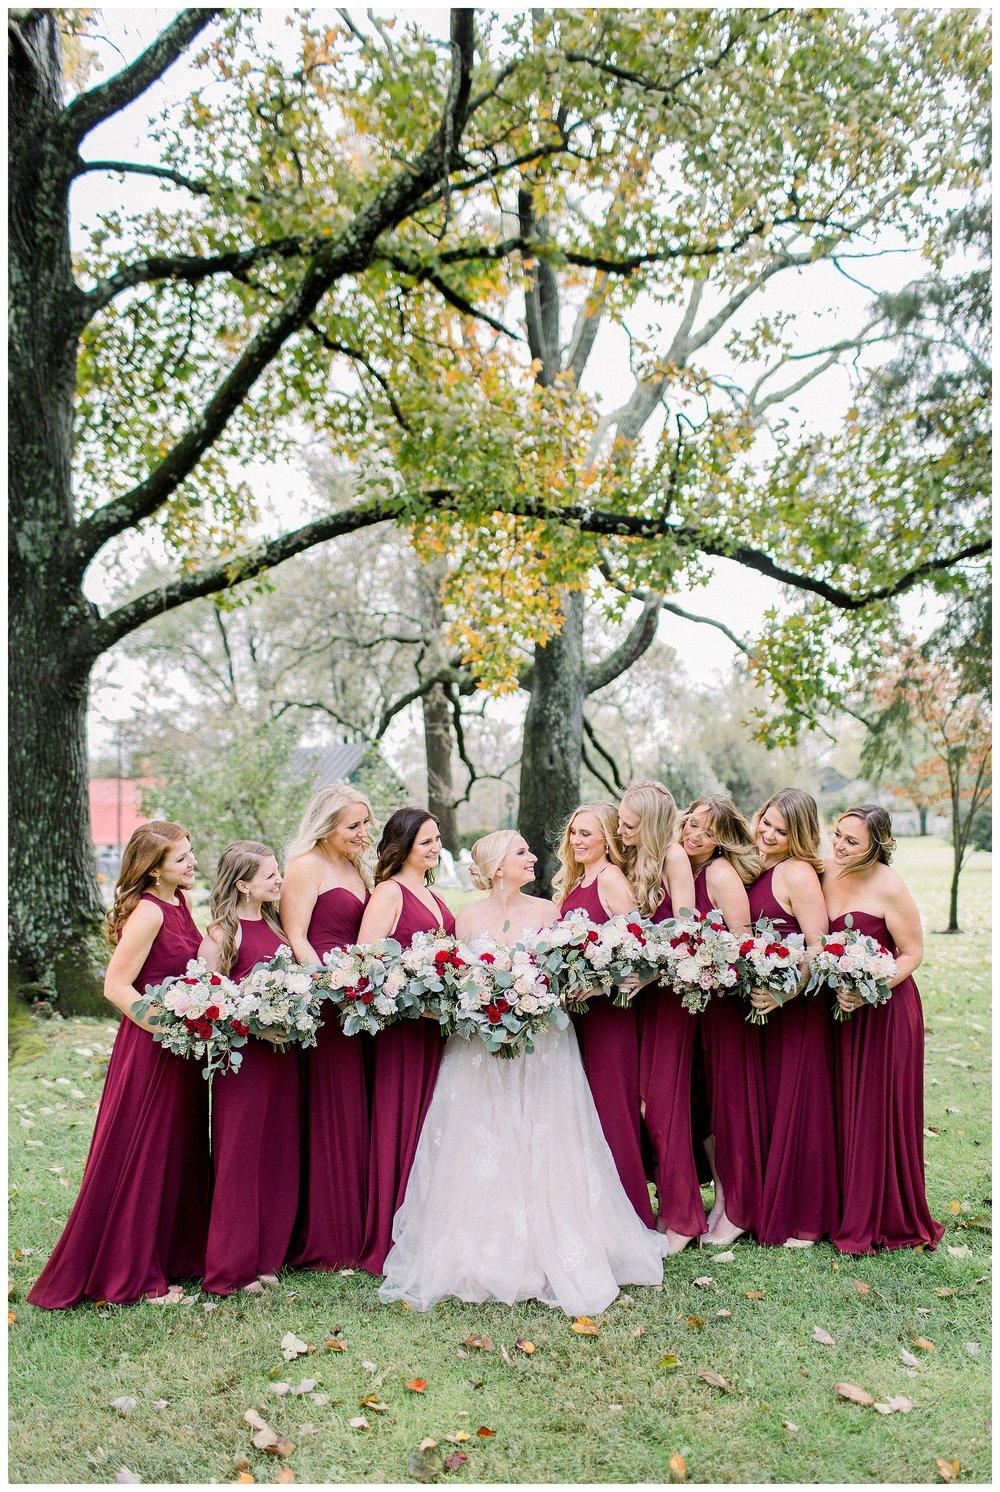 Whitehall Estate Wedding | Northern Virginia Wedding Photographer Kir Tuben_0043.jpg